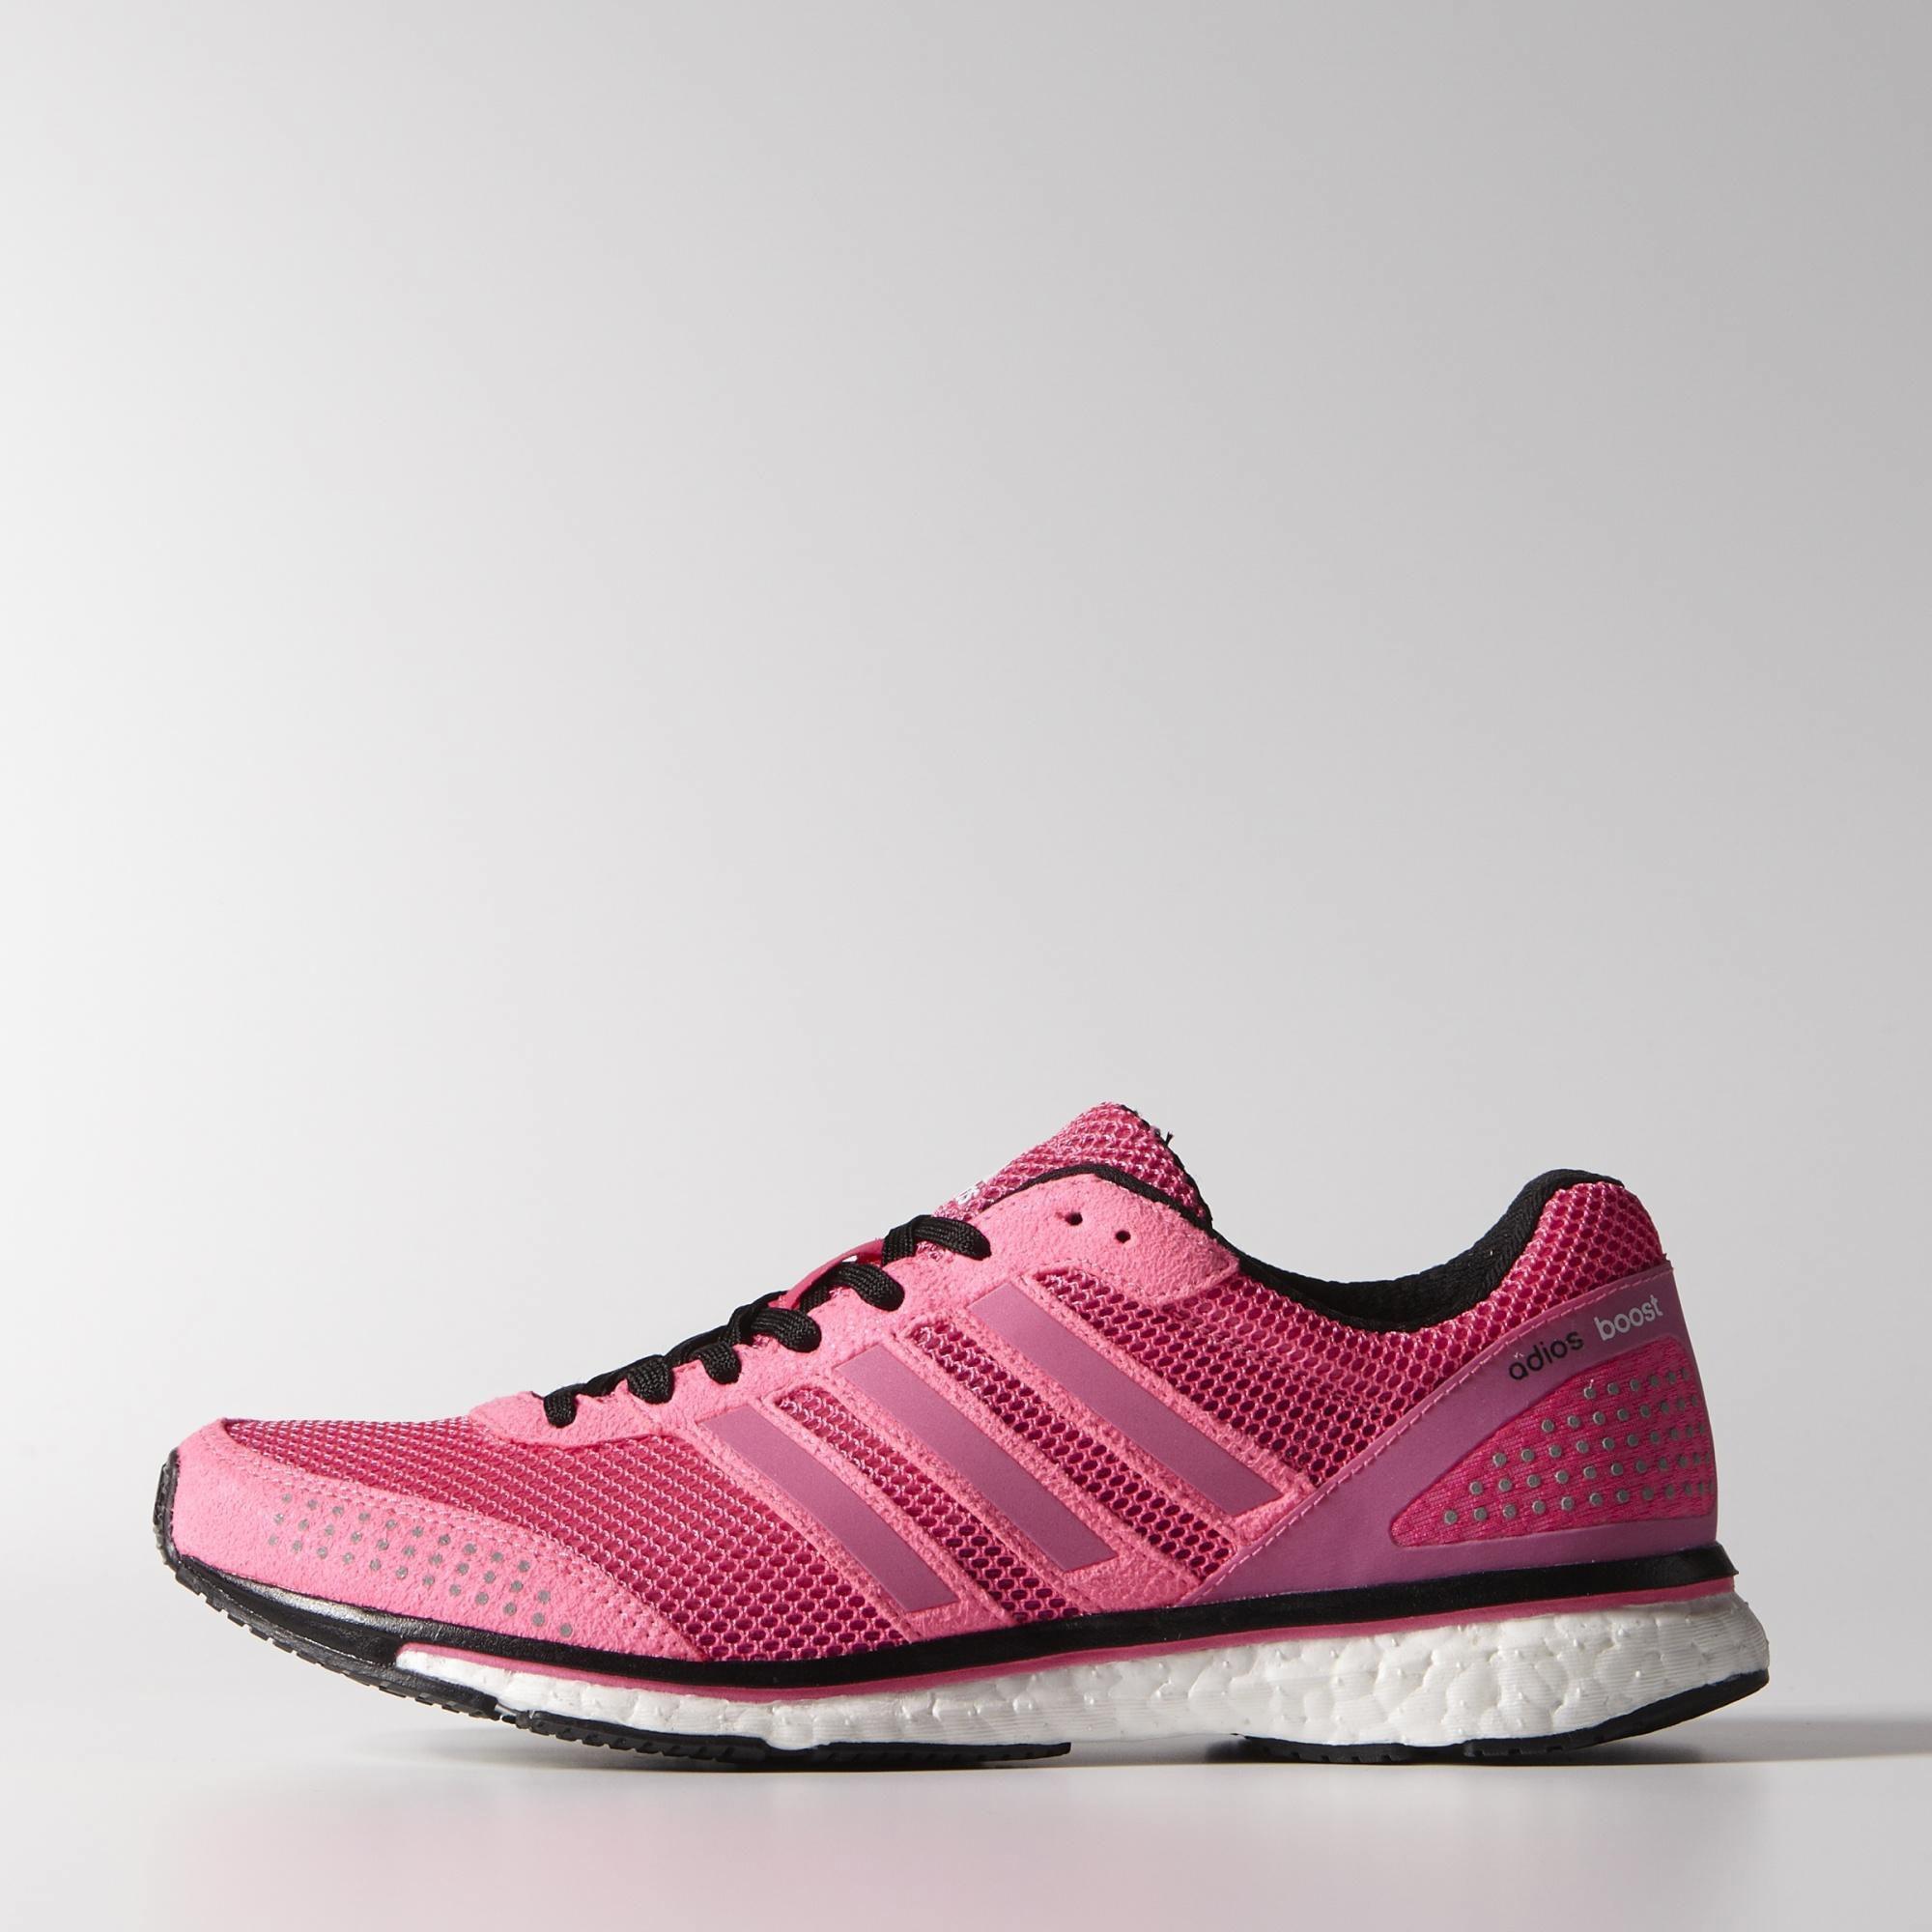 adidas womens adizero adios boost 2 0 running shoes solar pink. Black Bedroom Furniture Sets. Home Design Ideas